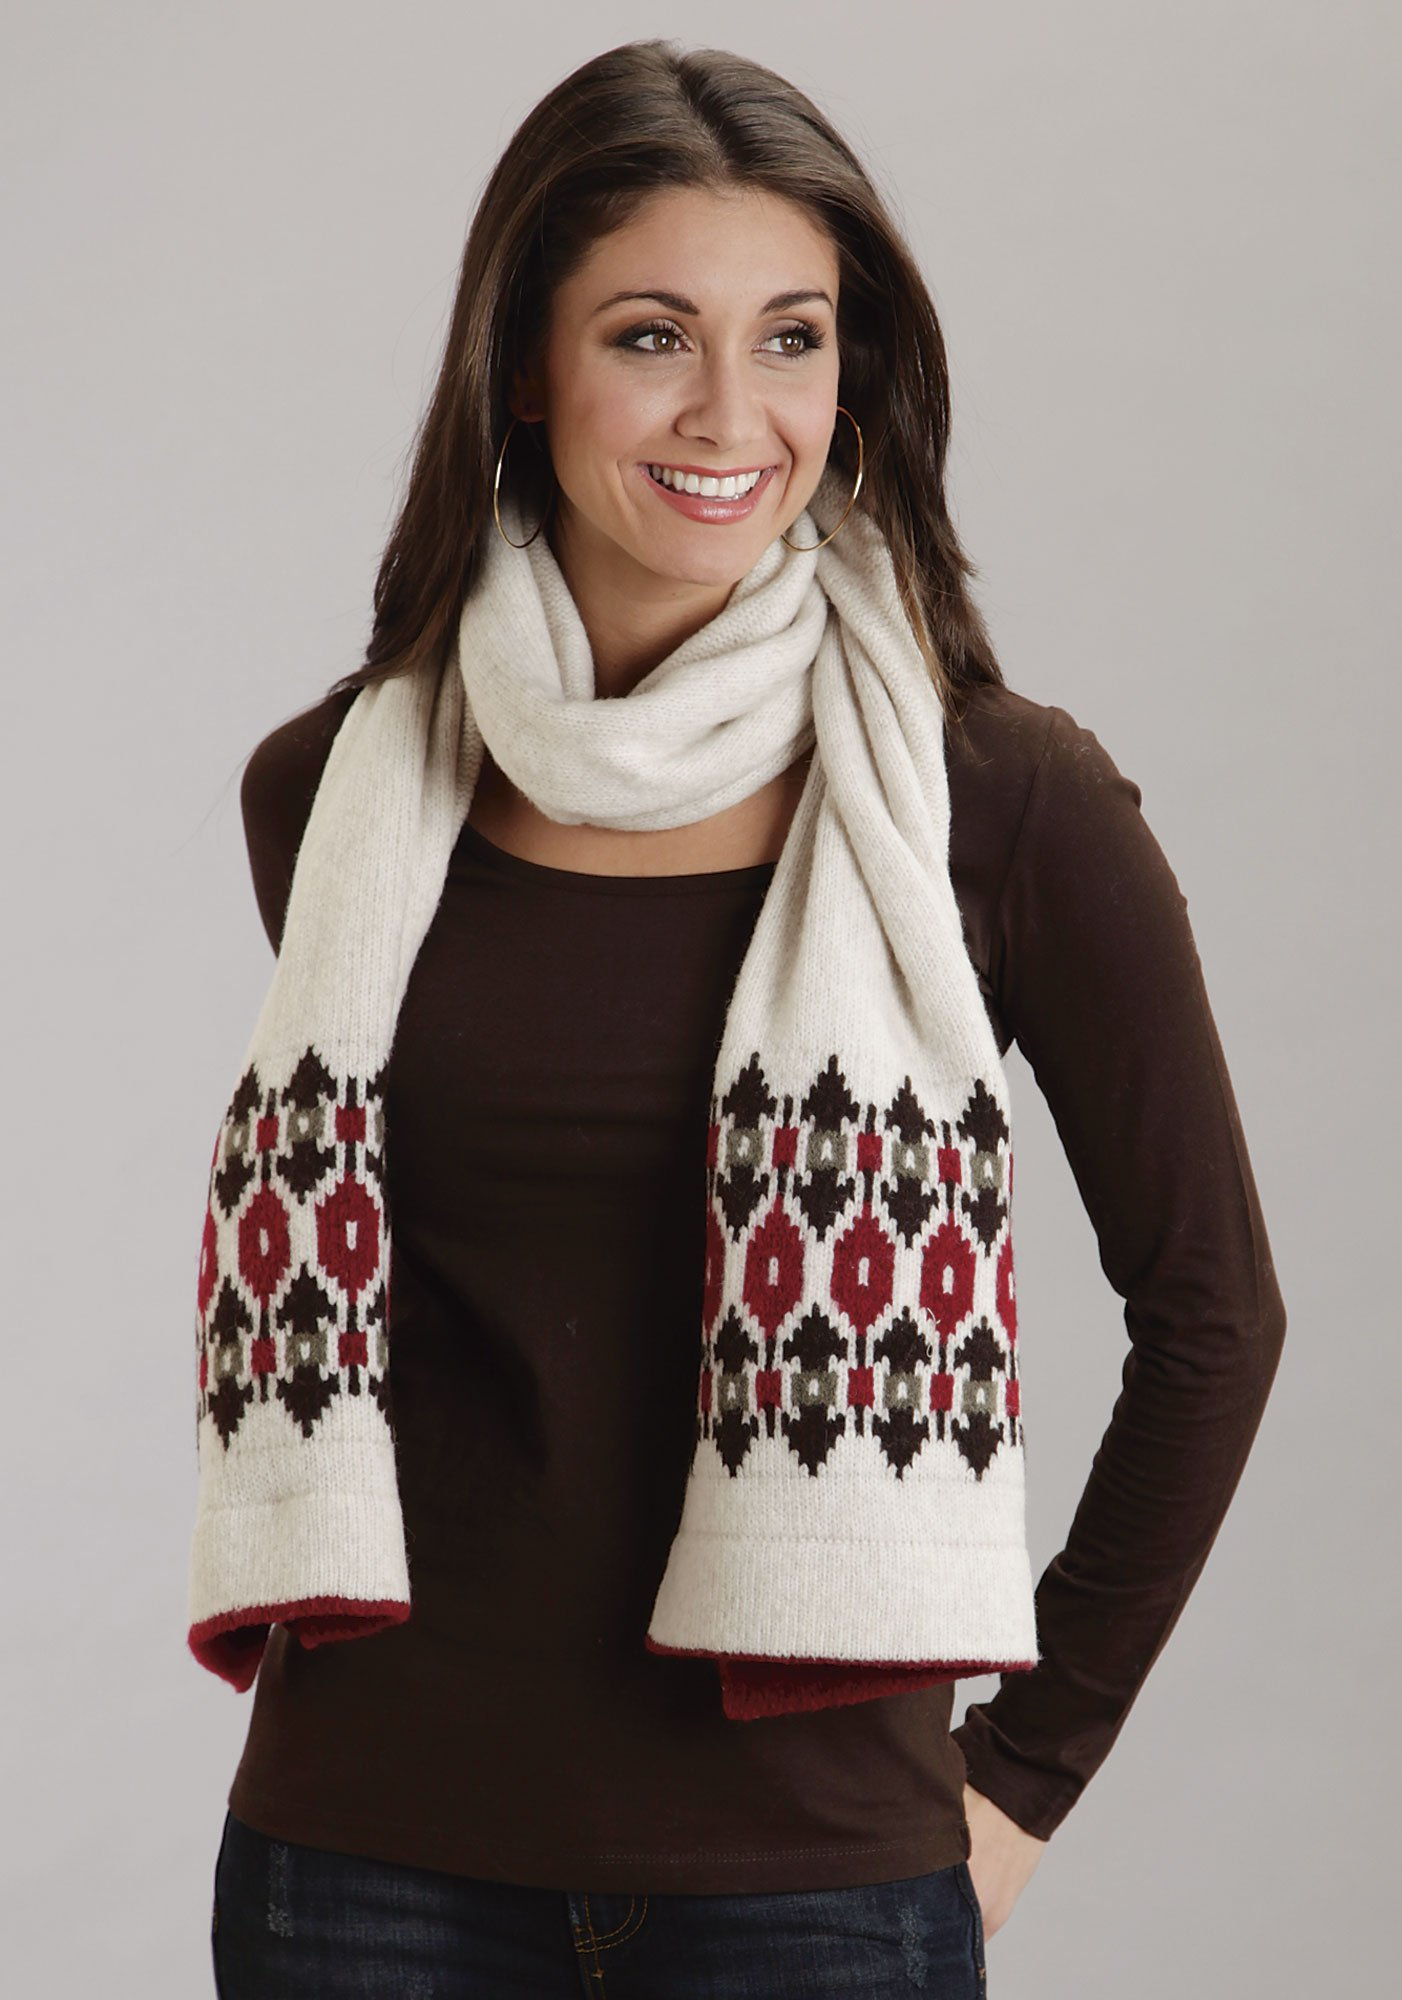 Stetson Womens Tan Wool Blend Intarsia Pattern Sweater Knit Scarf PPK